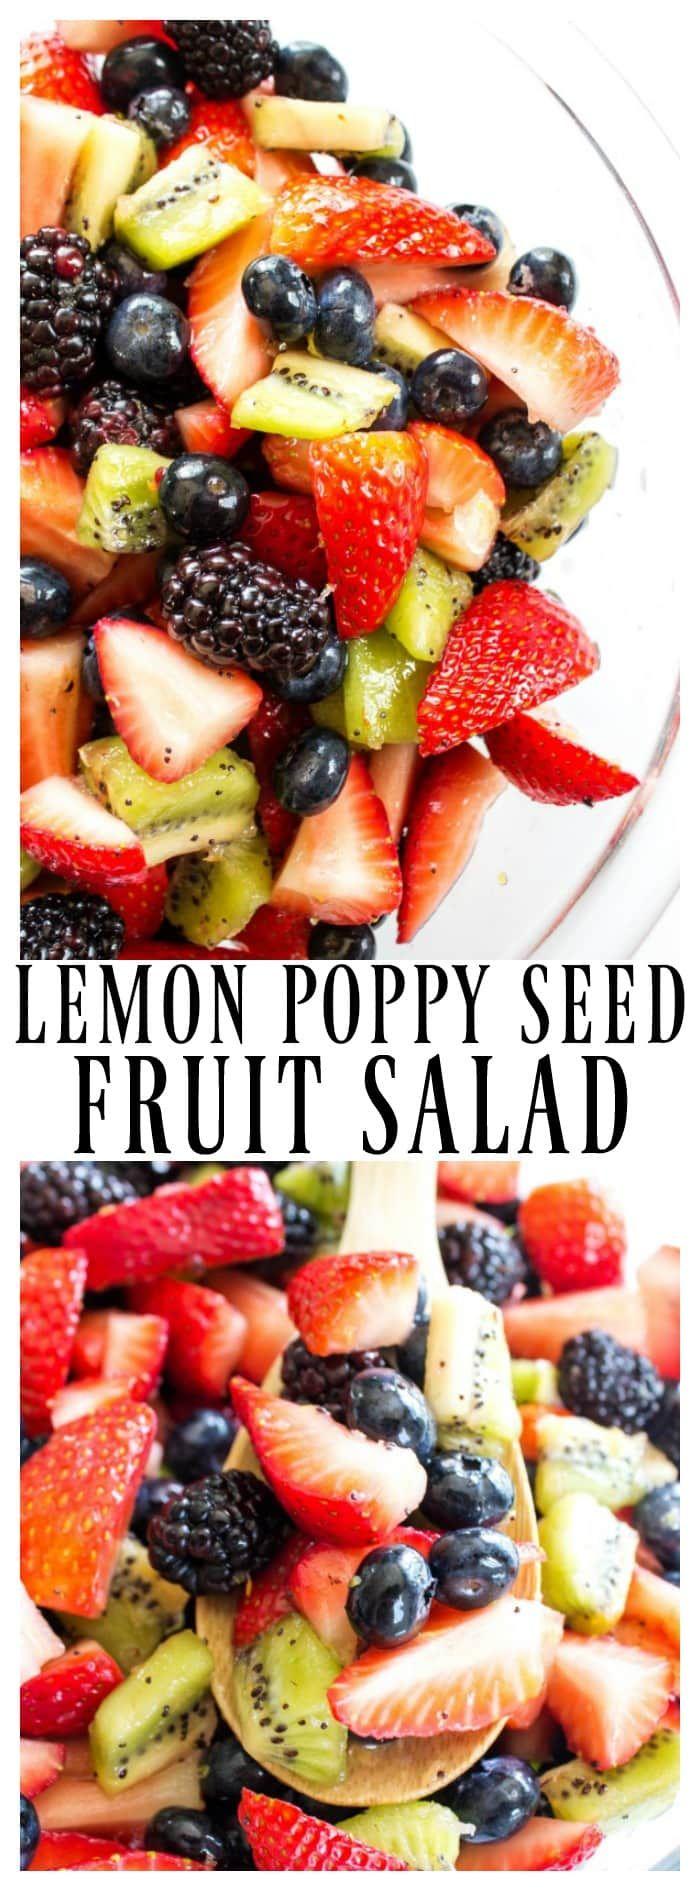 lemon-poppy-seed-fruit-salad-bowl-long-pin